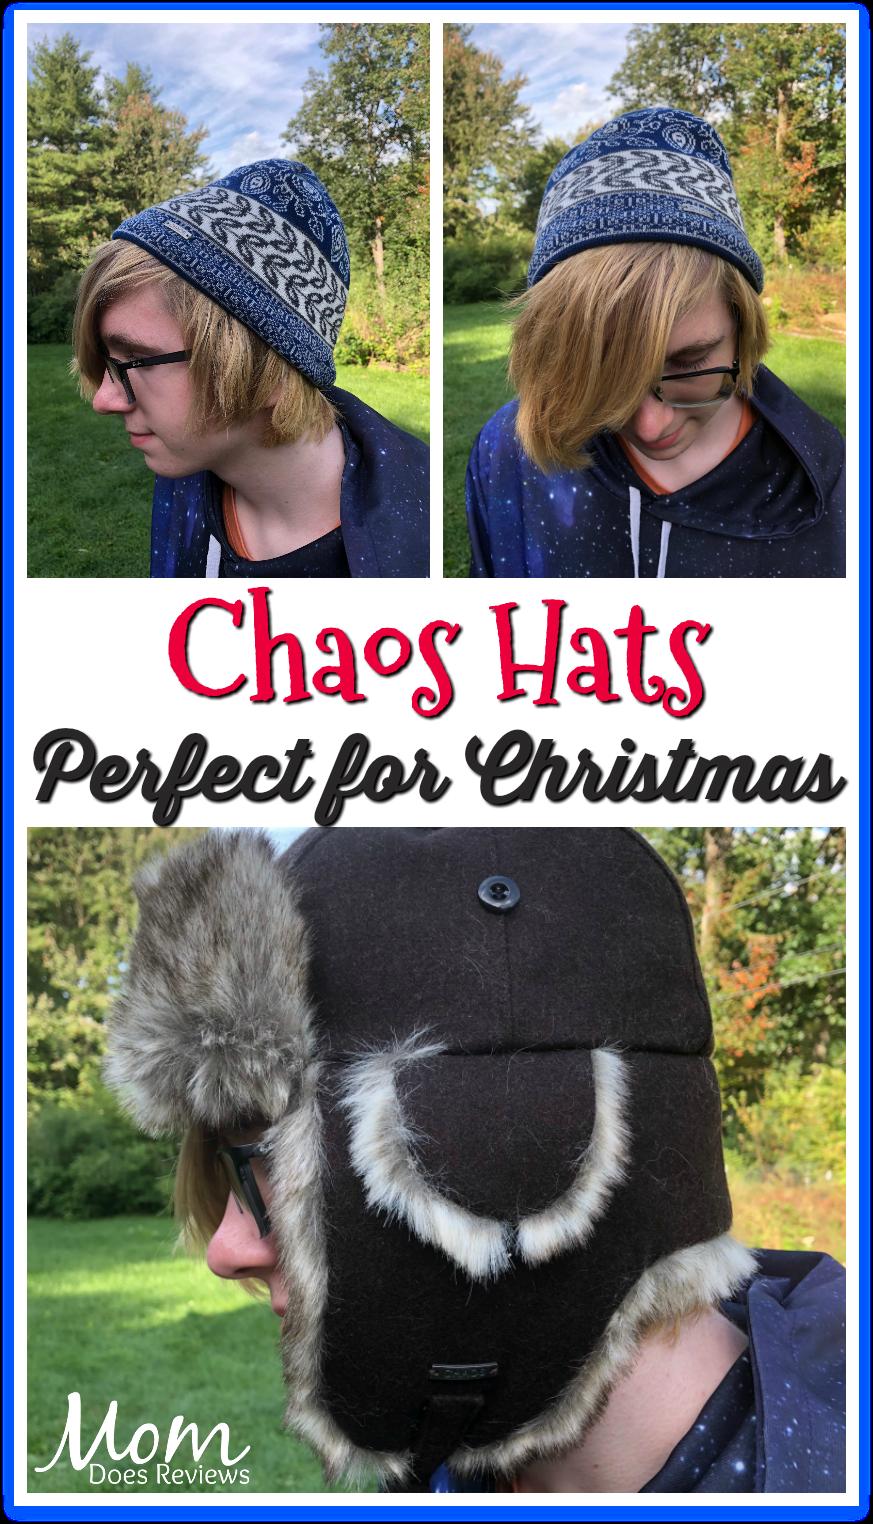 Chaos hats #MEGAChristmas18